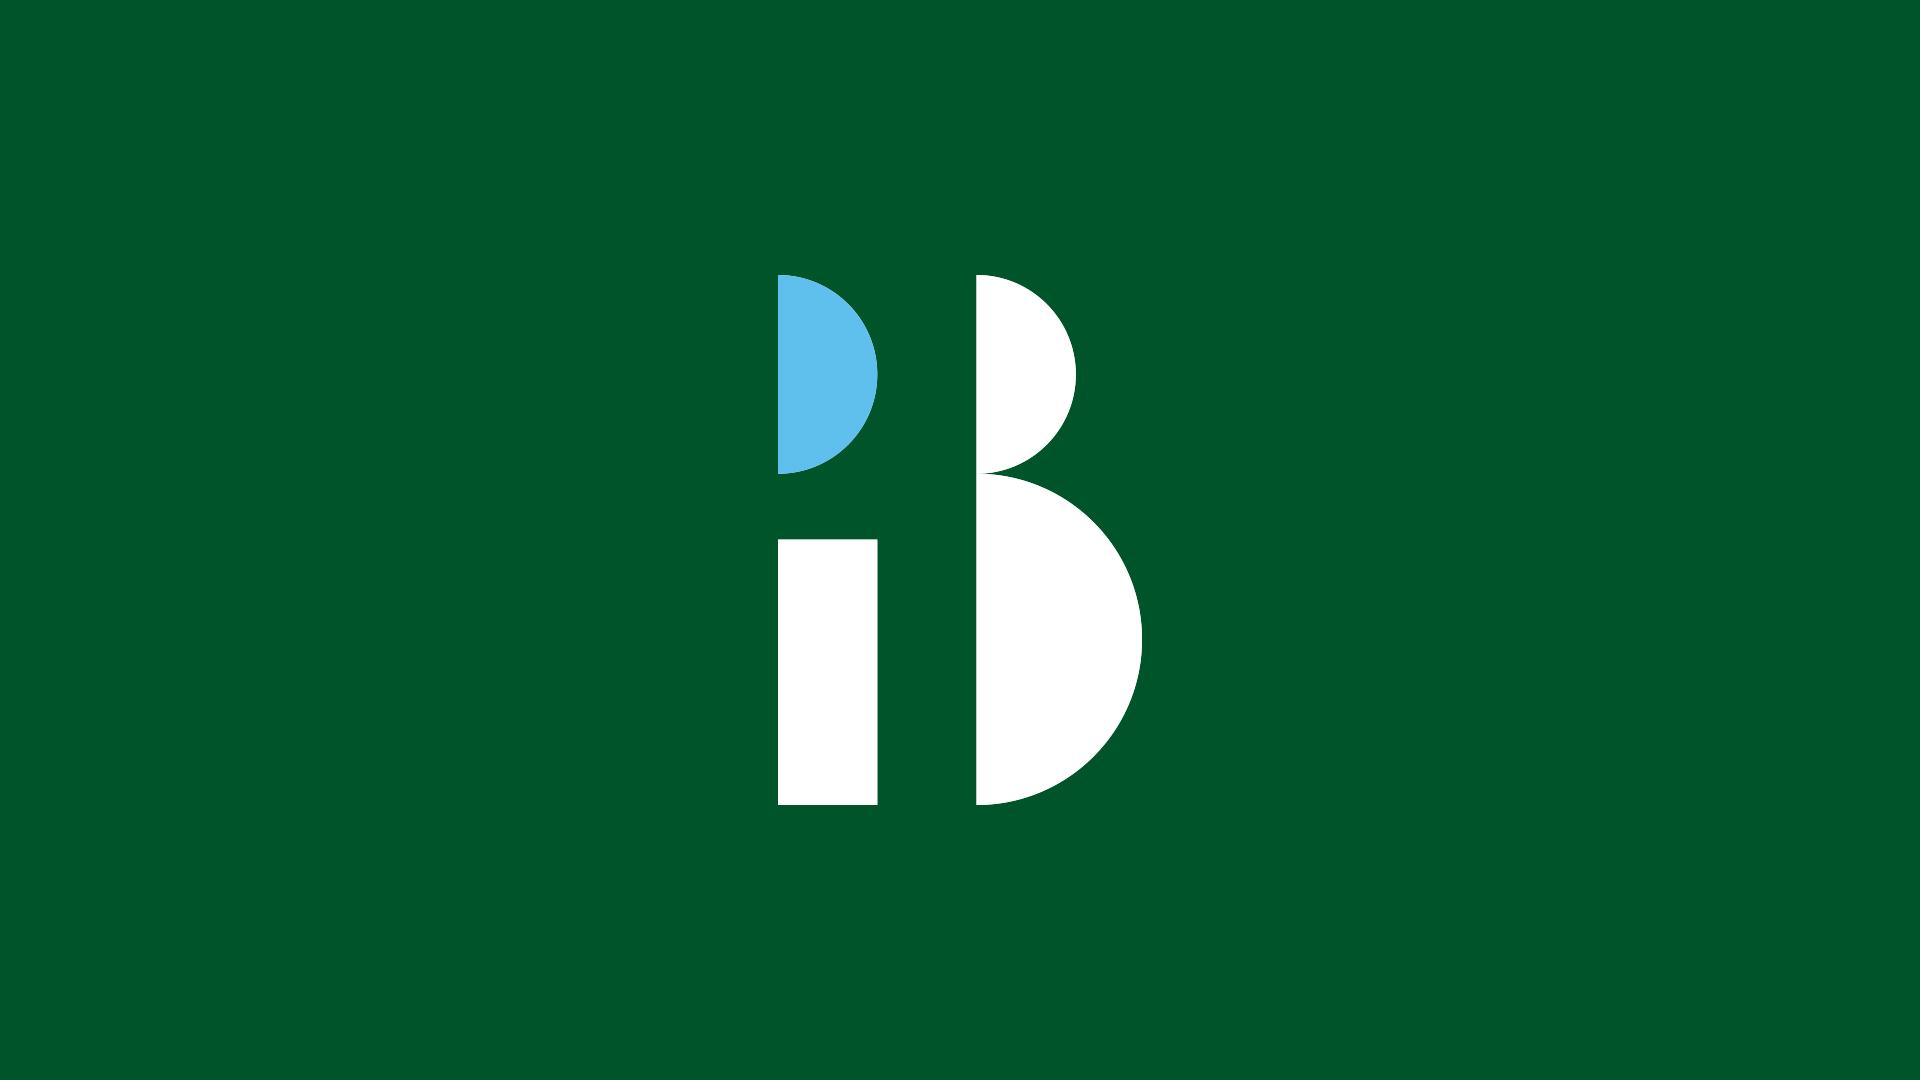 Symbol_Green